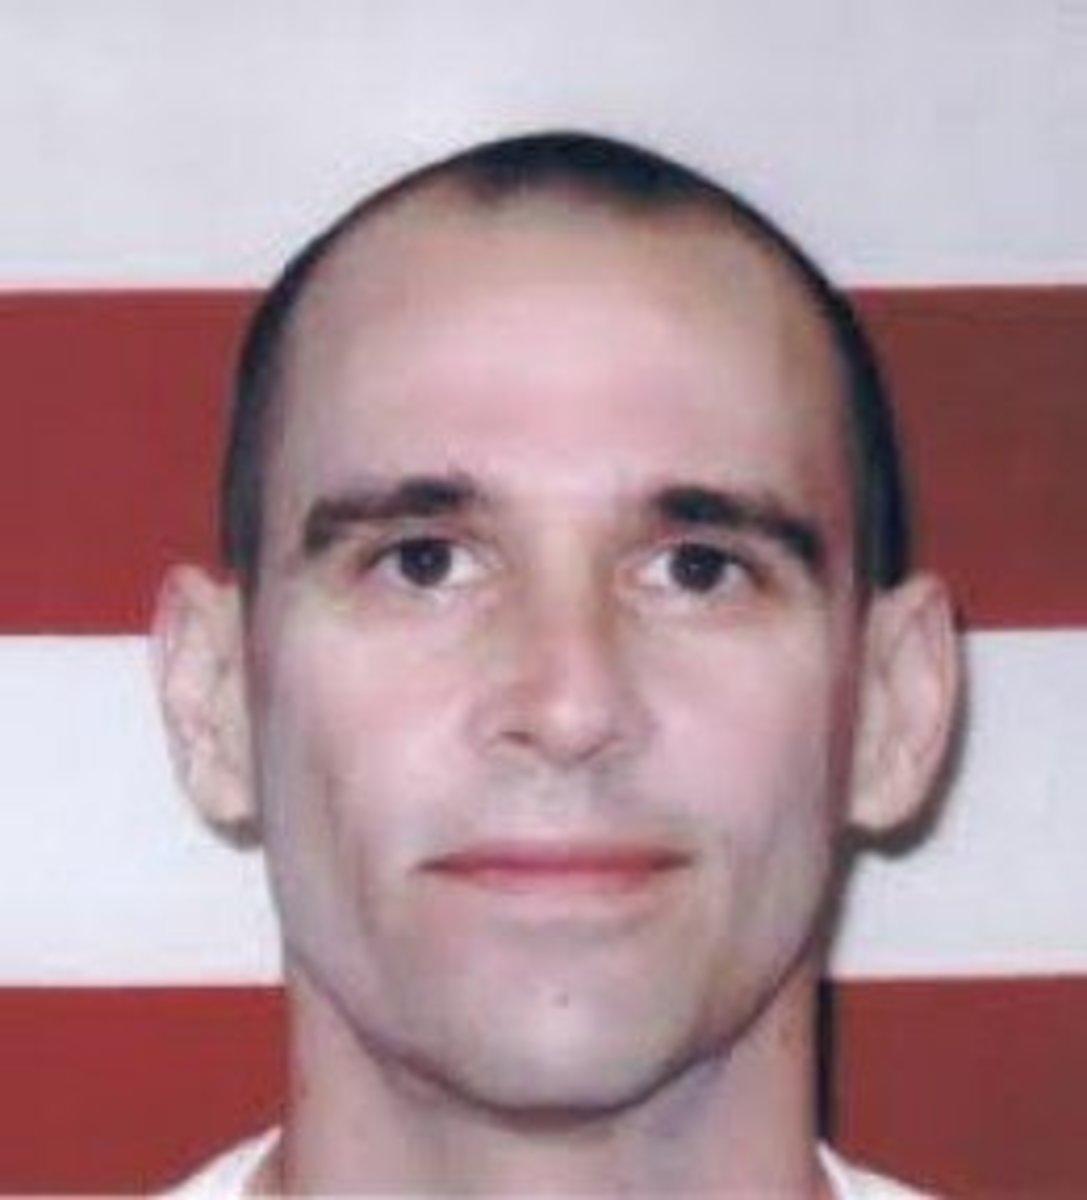 Joel Radovcich